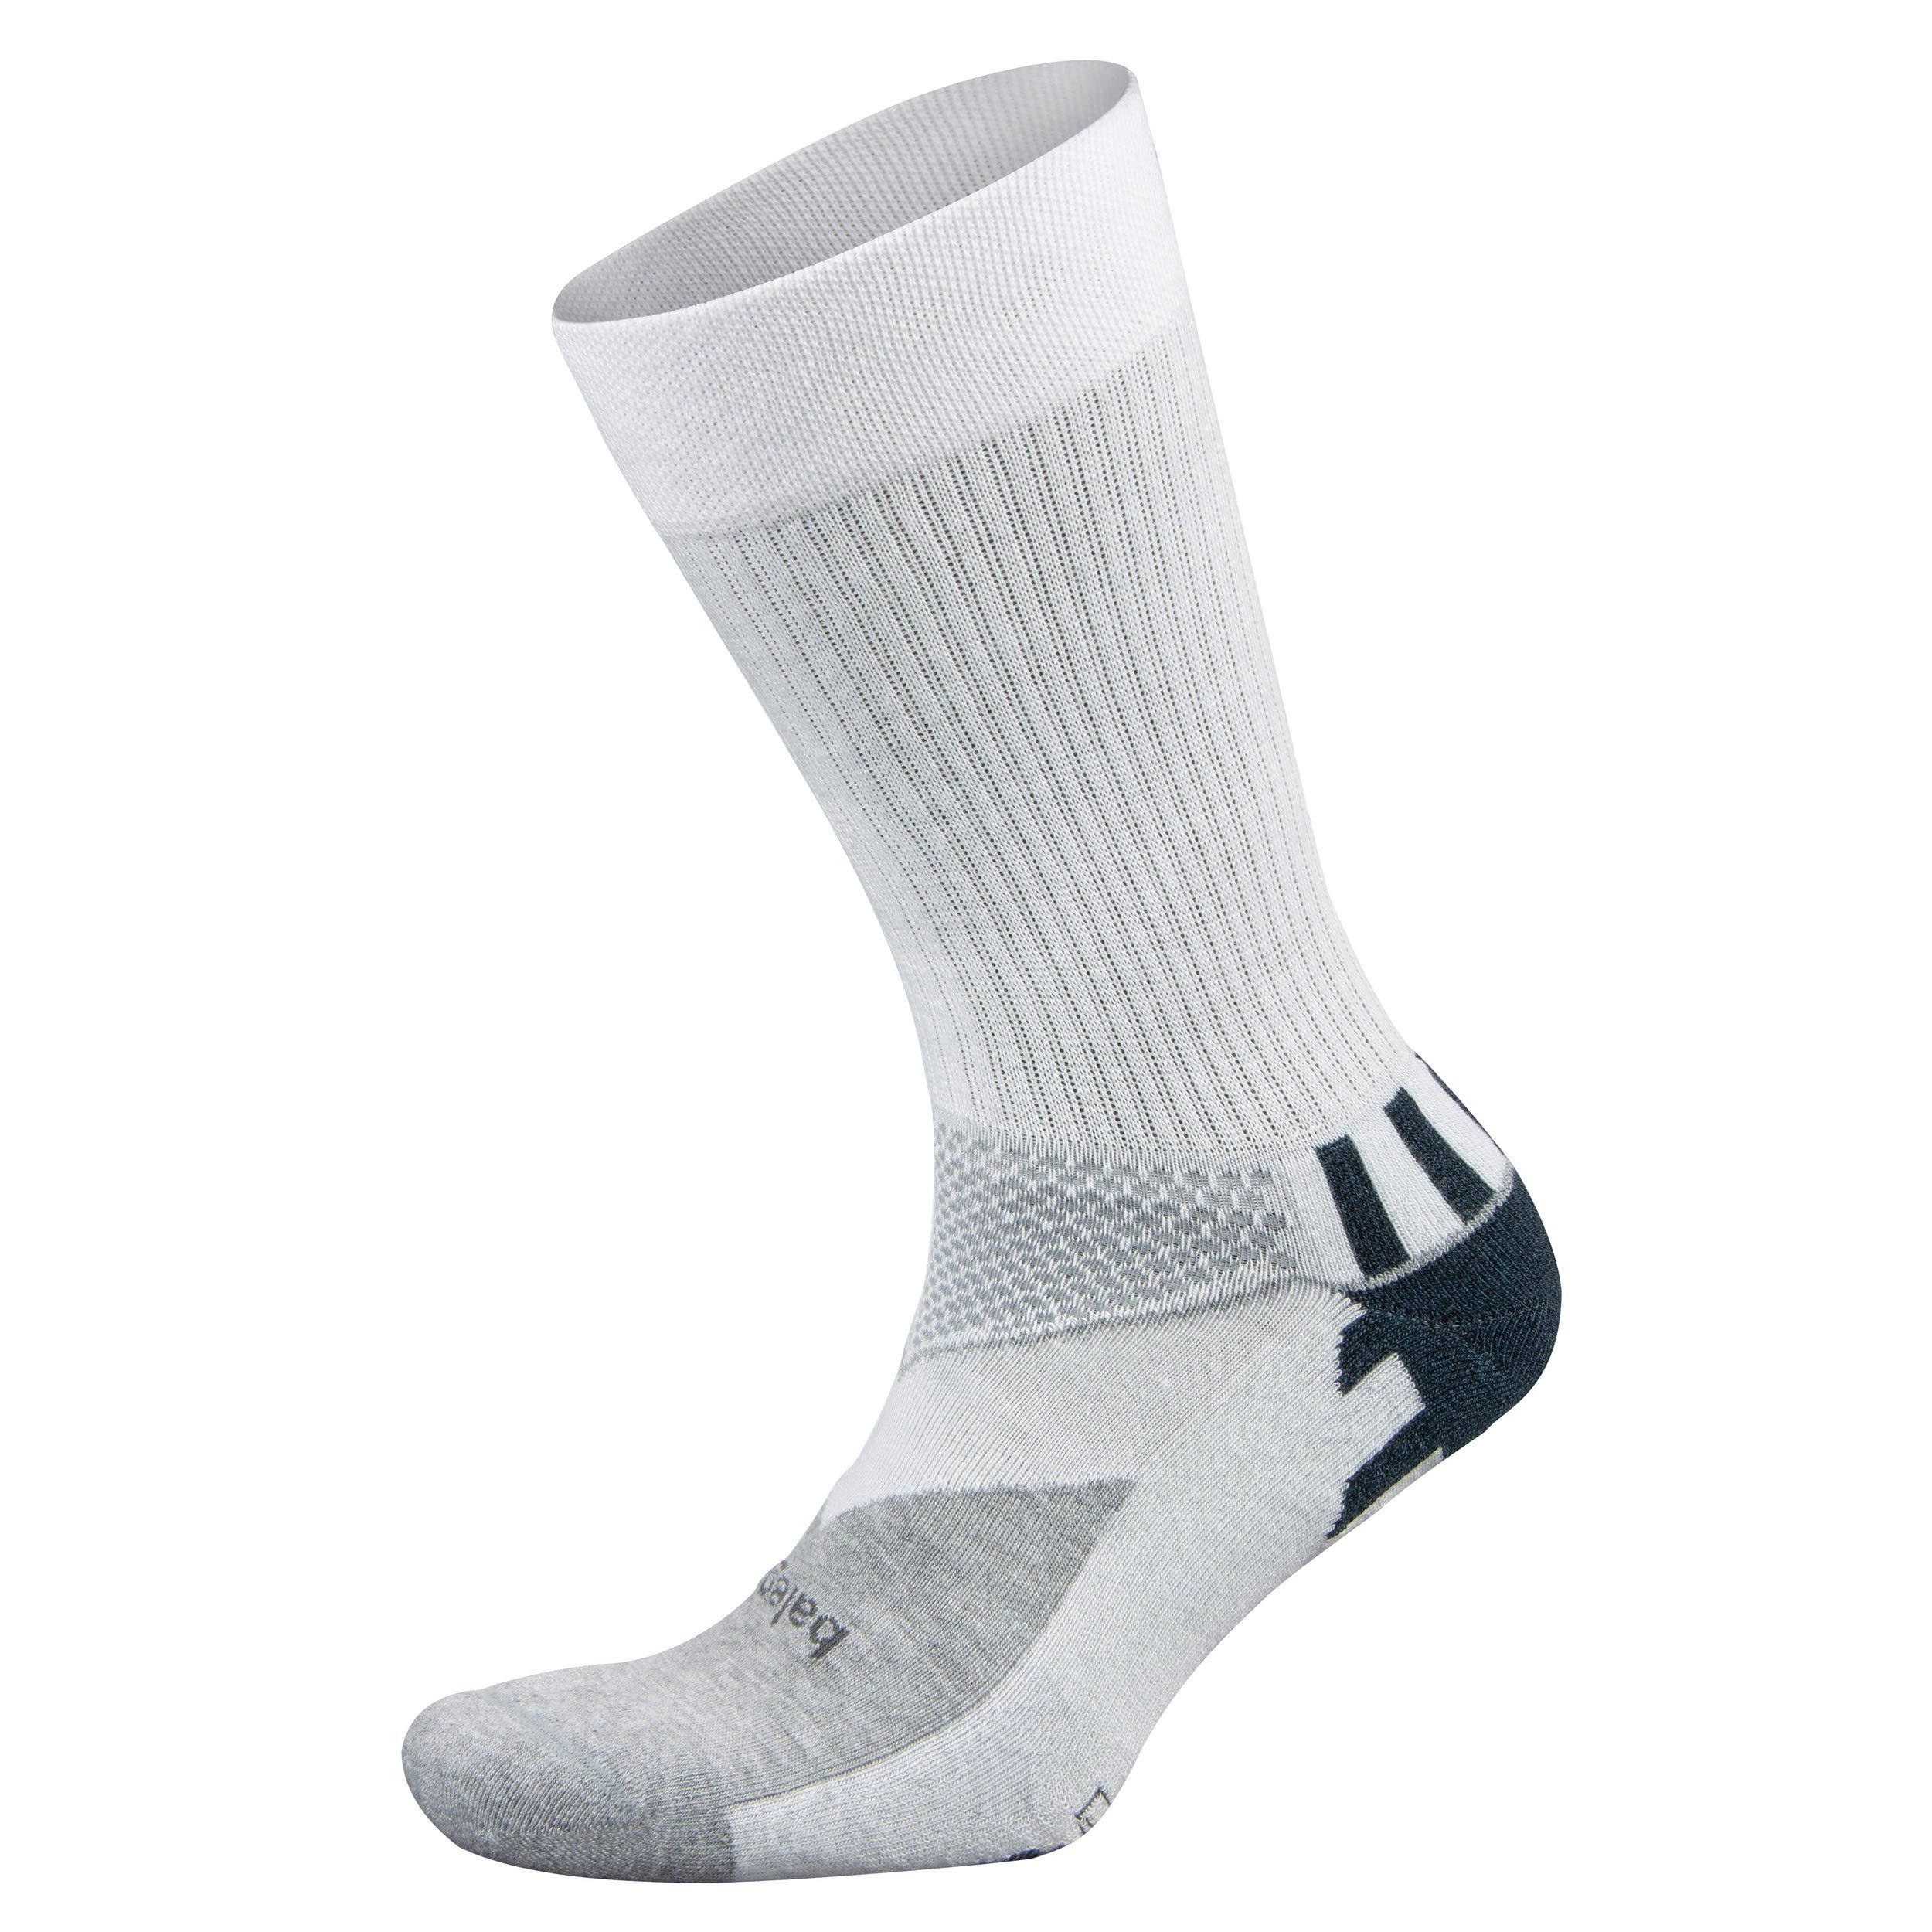 Balega Enduro V-Tech Crew Socks For Men and Women (1 Pair), White/Grey Heather, Small by Balega